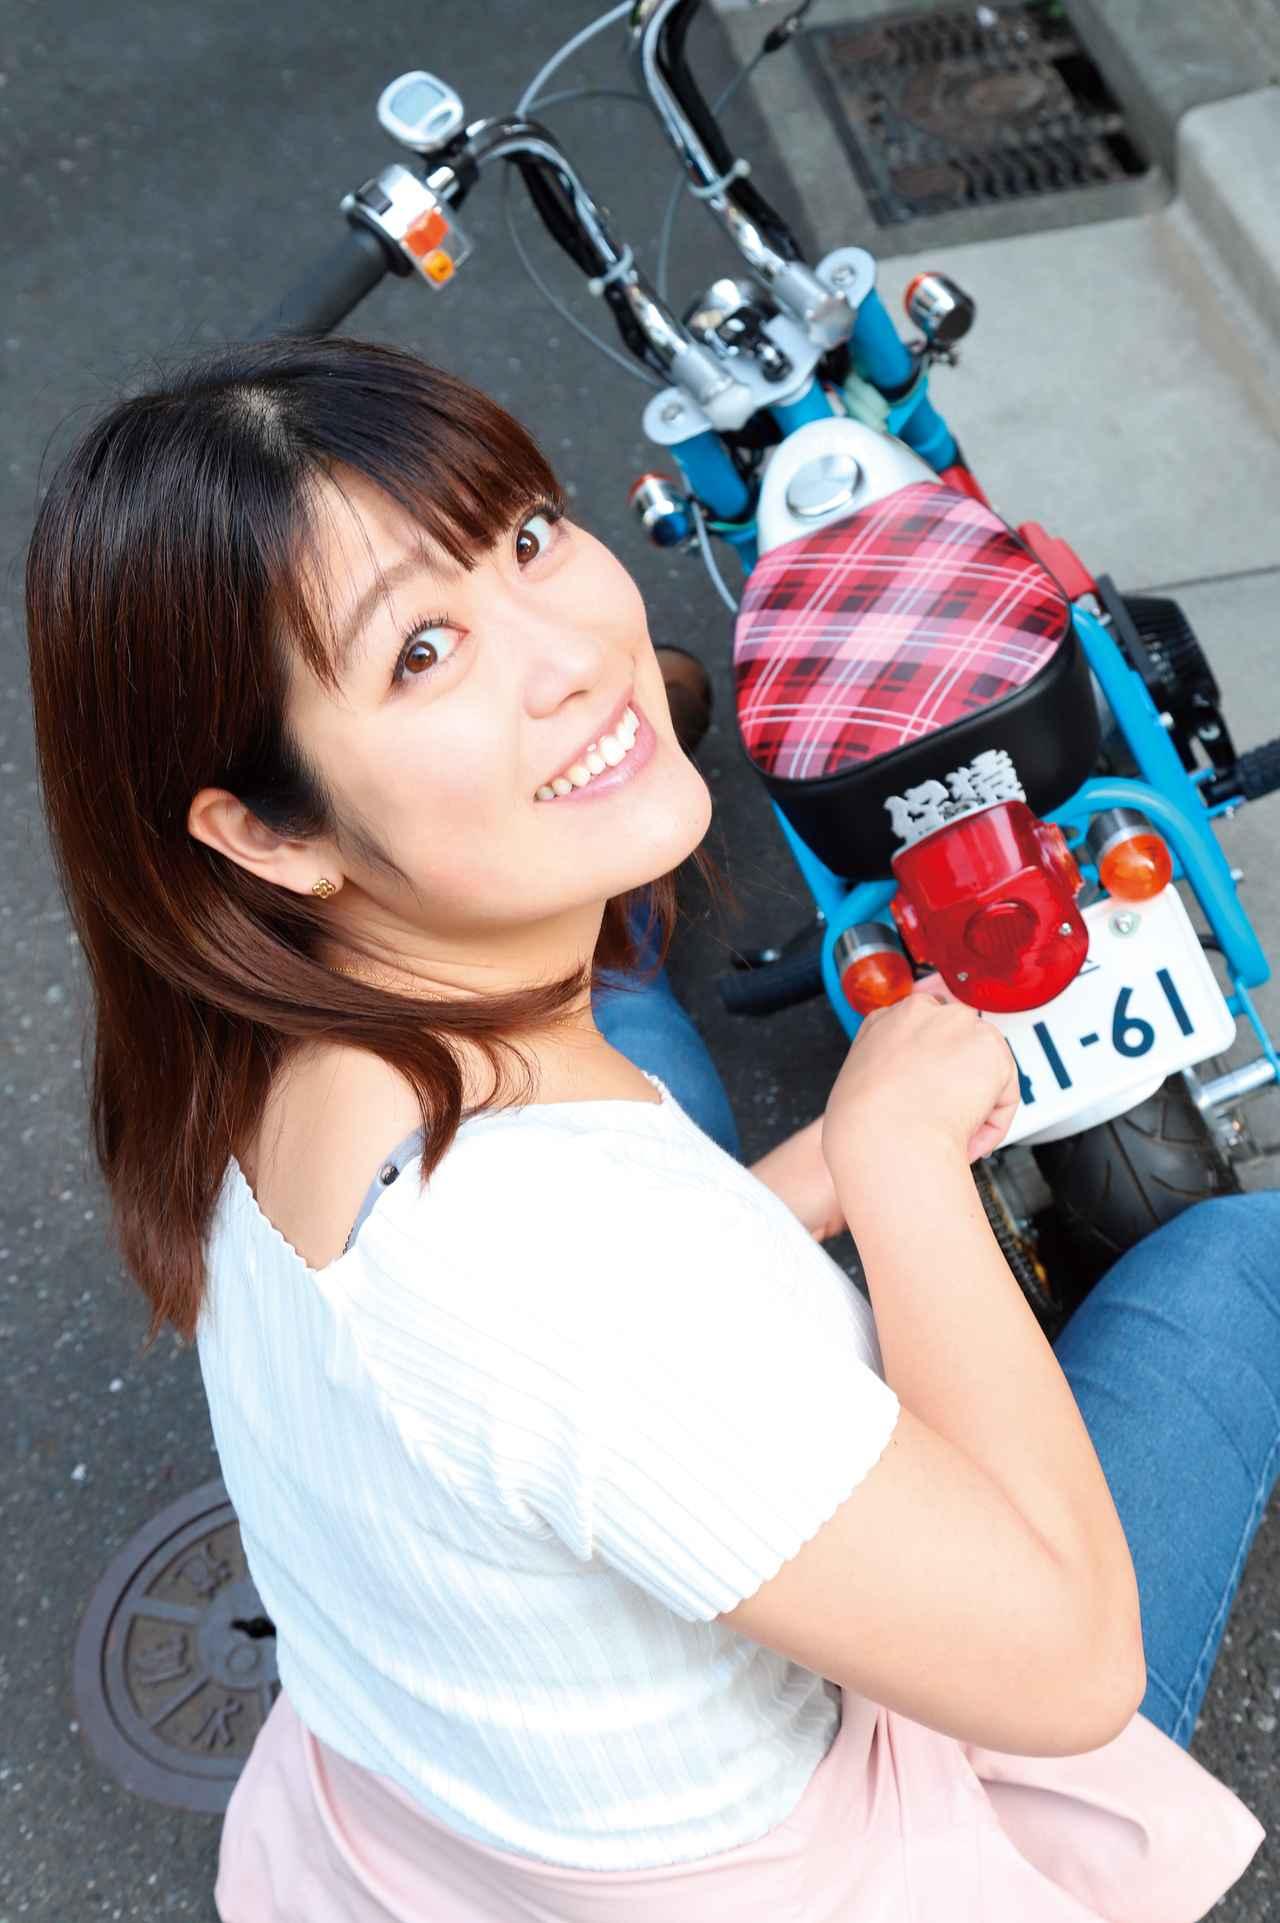 Images : 2番目の画像 - 「世界最小のキットバイク仔猿で走ろう‼ 試乗編「仔猿遊び・その3(全3回)」」のアルバム - webオートバイ